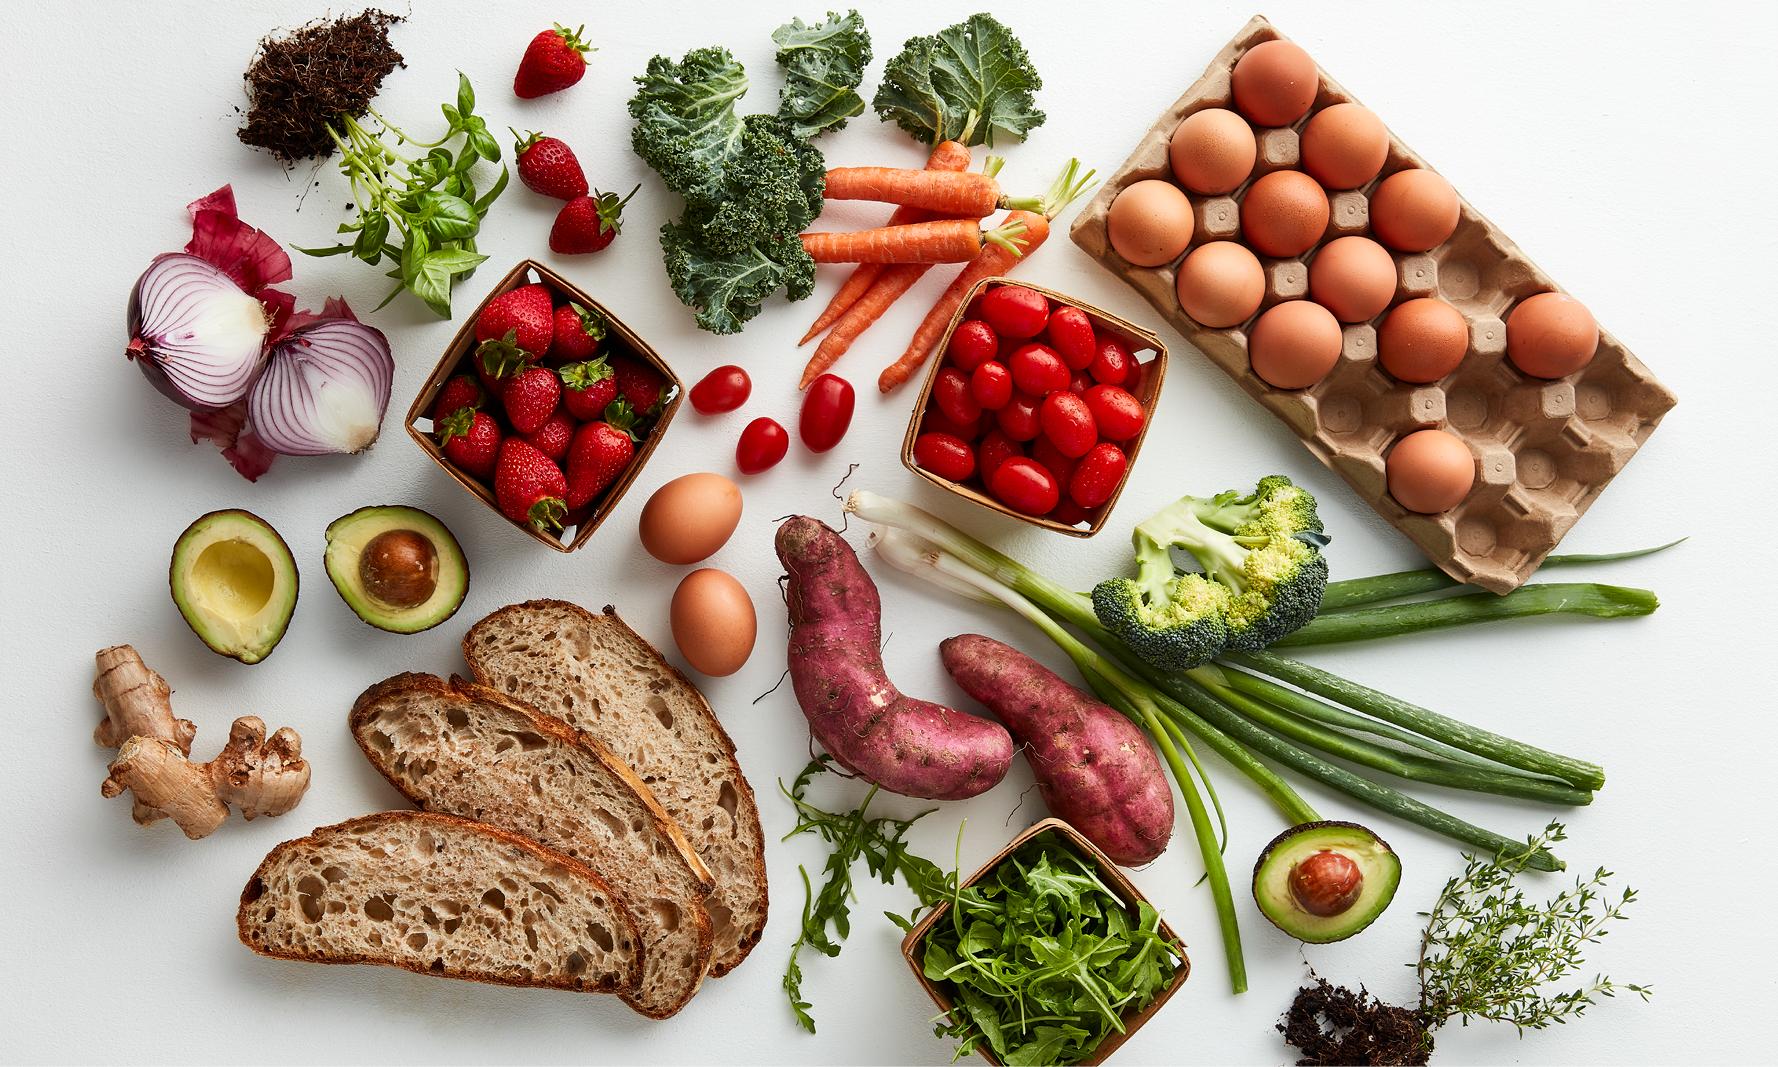 Bountiful vegetable & ingredient image - Vegetable intake